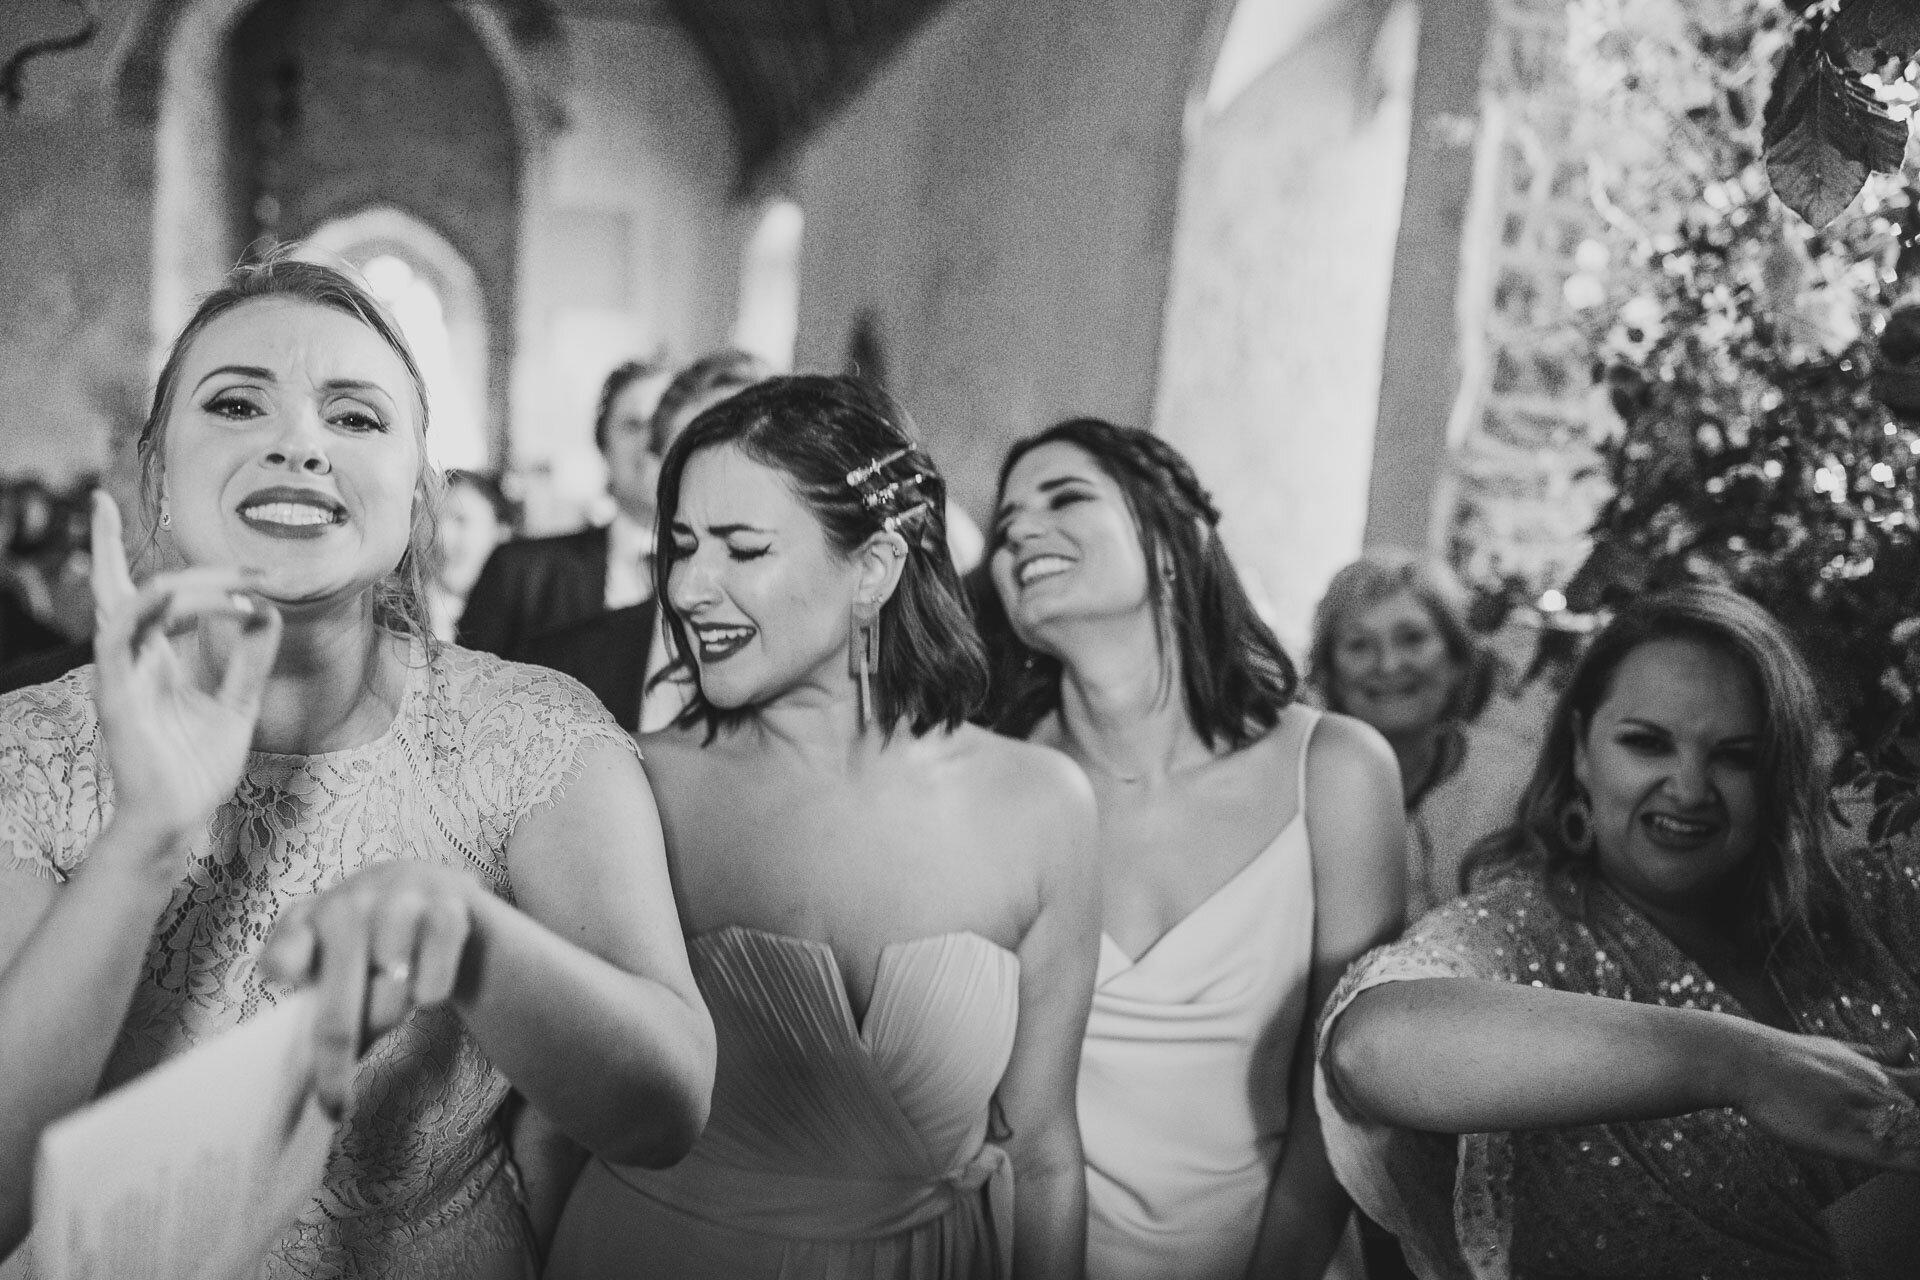 dorset_wedding_photographer-51.jpg